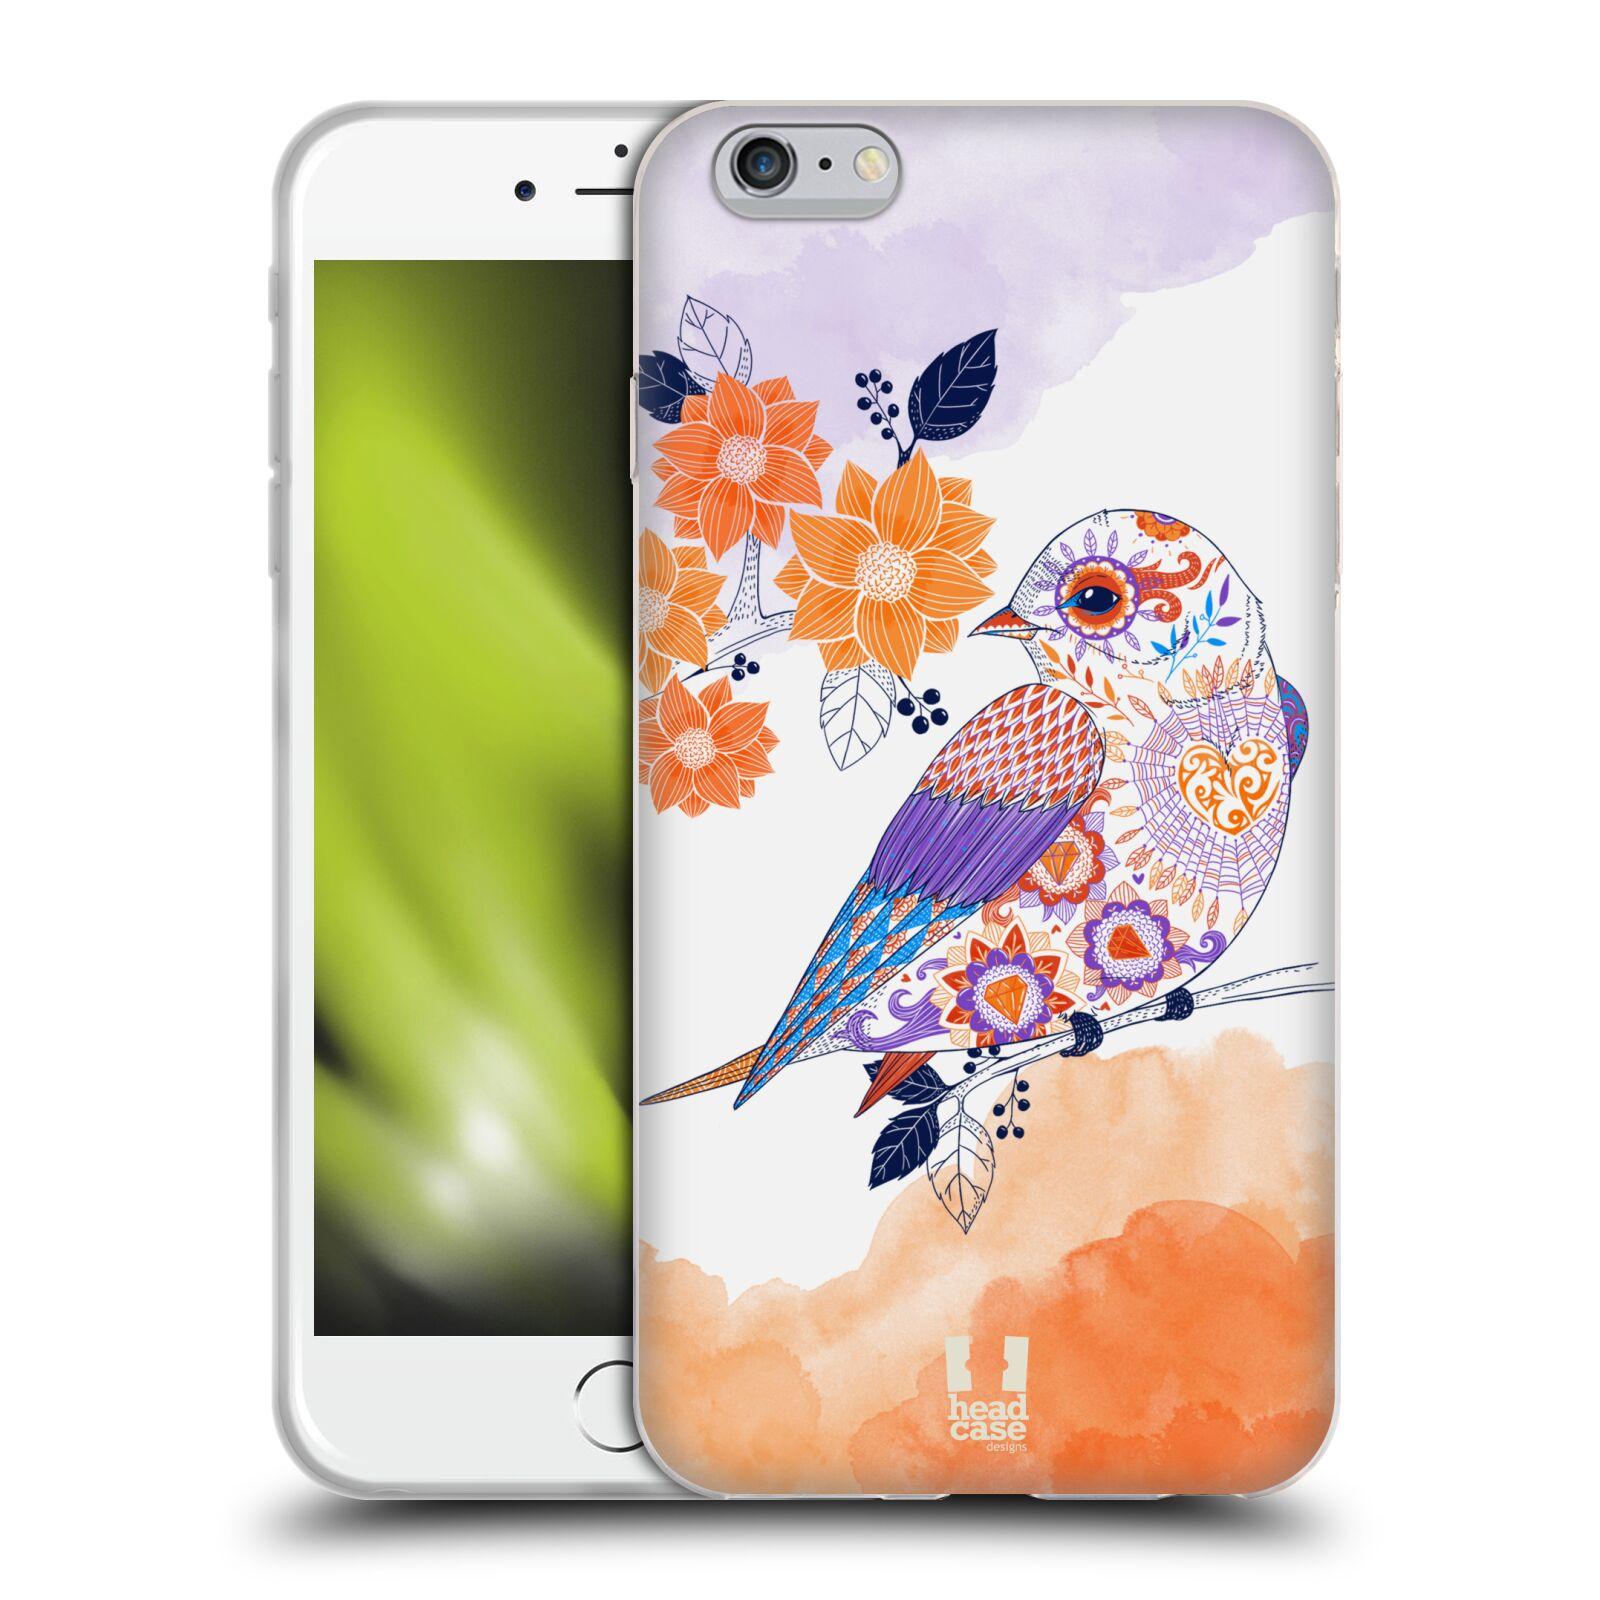 HEAD CASE silikonový obal na mobil Apple Iphone 6 PLUS/ 6S PLUS vzor Květina ptáčci ORANŽOVÁ